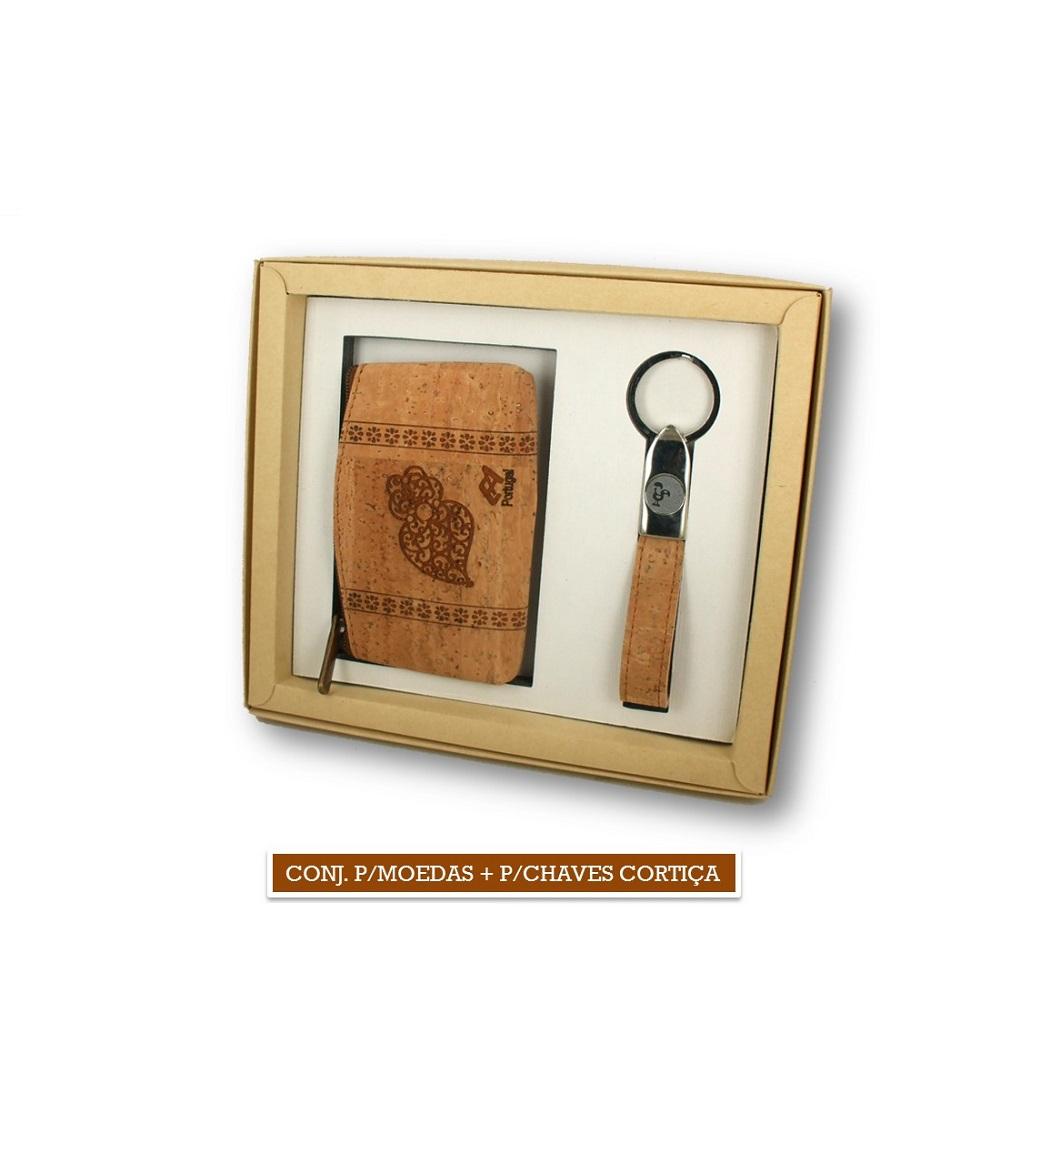 Conjunto Porta-moedas + Porta-chaves de Cortiça